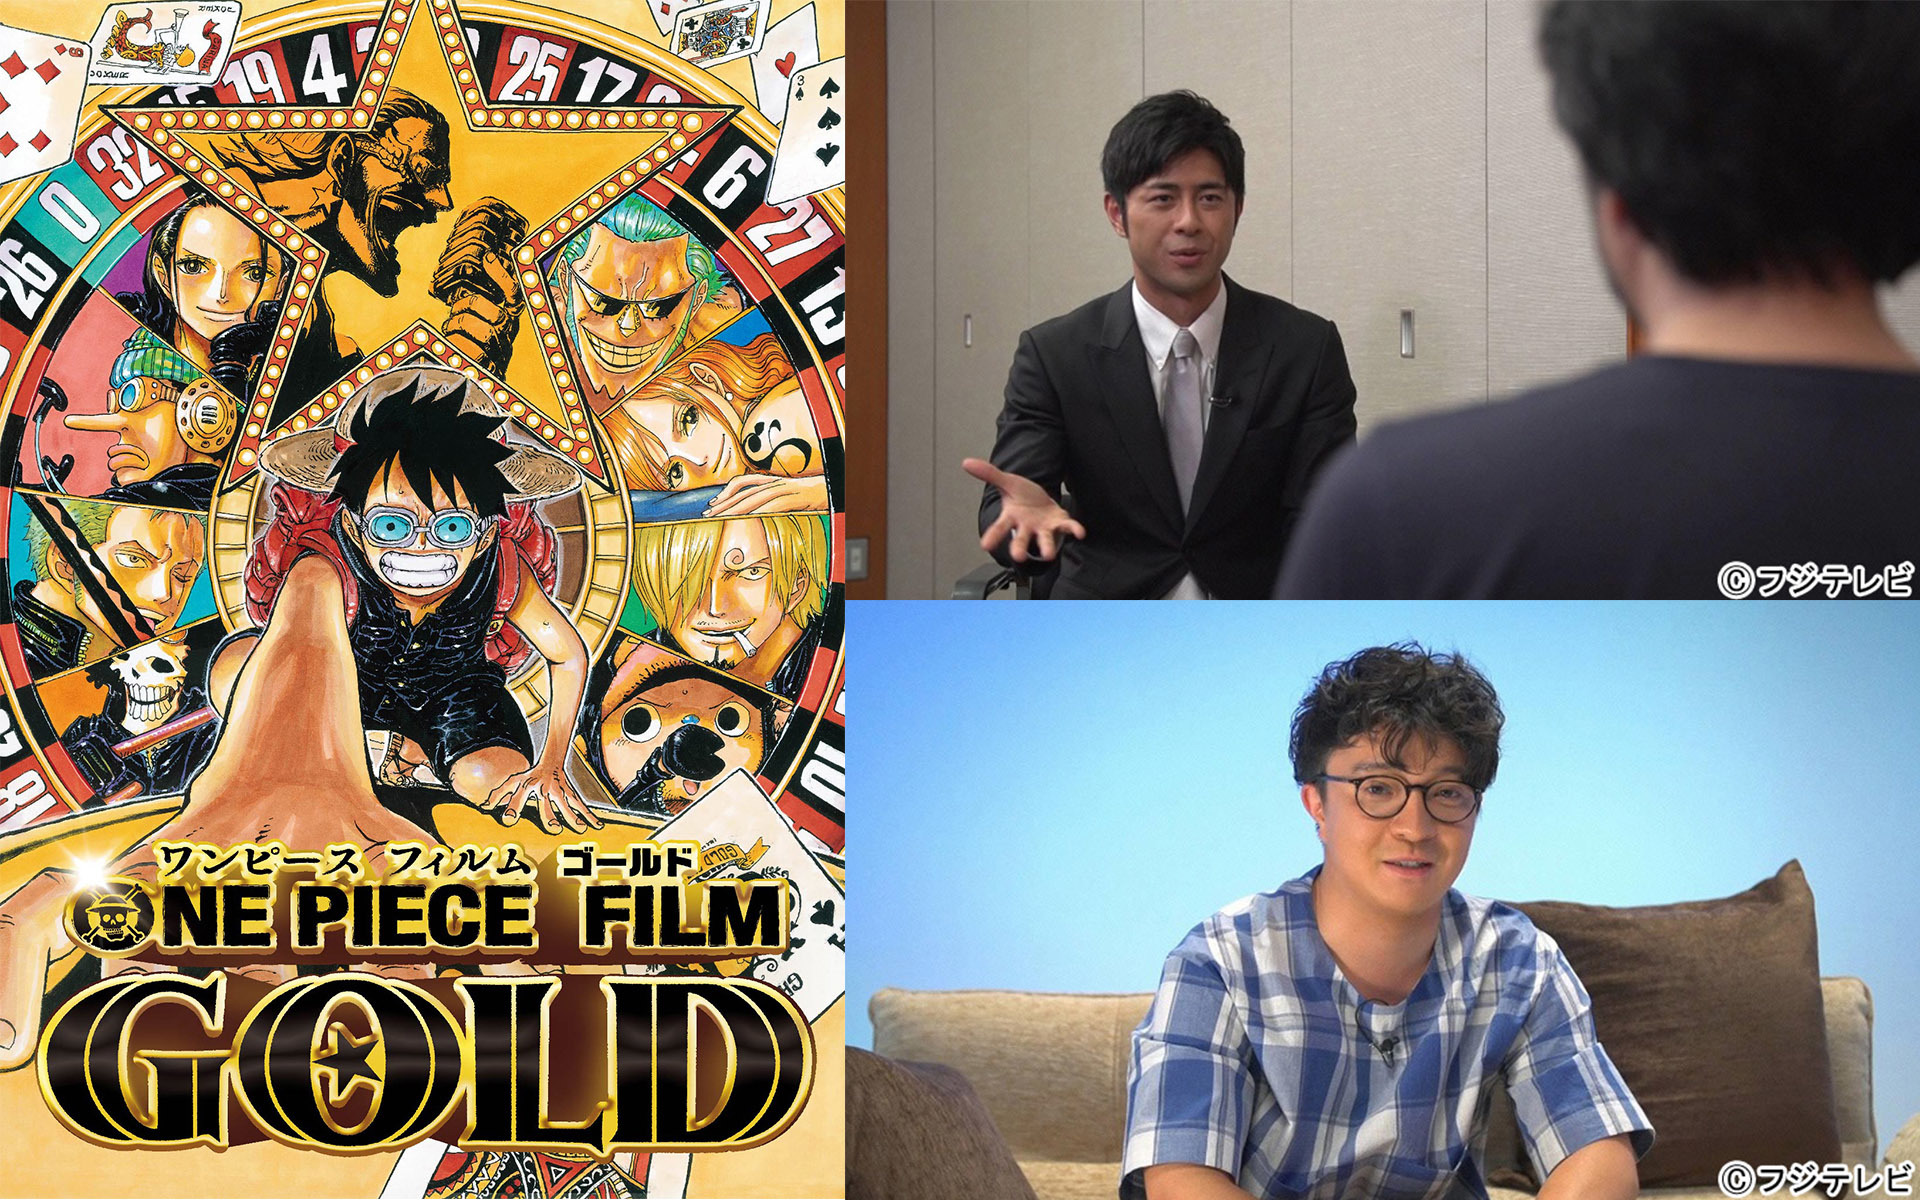 『ONE PIECE FILM GOLD』ビジュアル(左)、インタビュアーの榎並大二郎とそれに応える尾田栄一郎(右上) 『ONE PIECE』を語る濱田岳(右下)